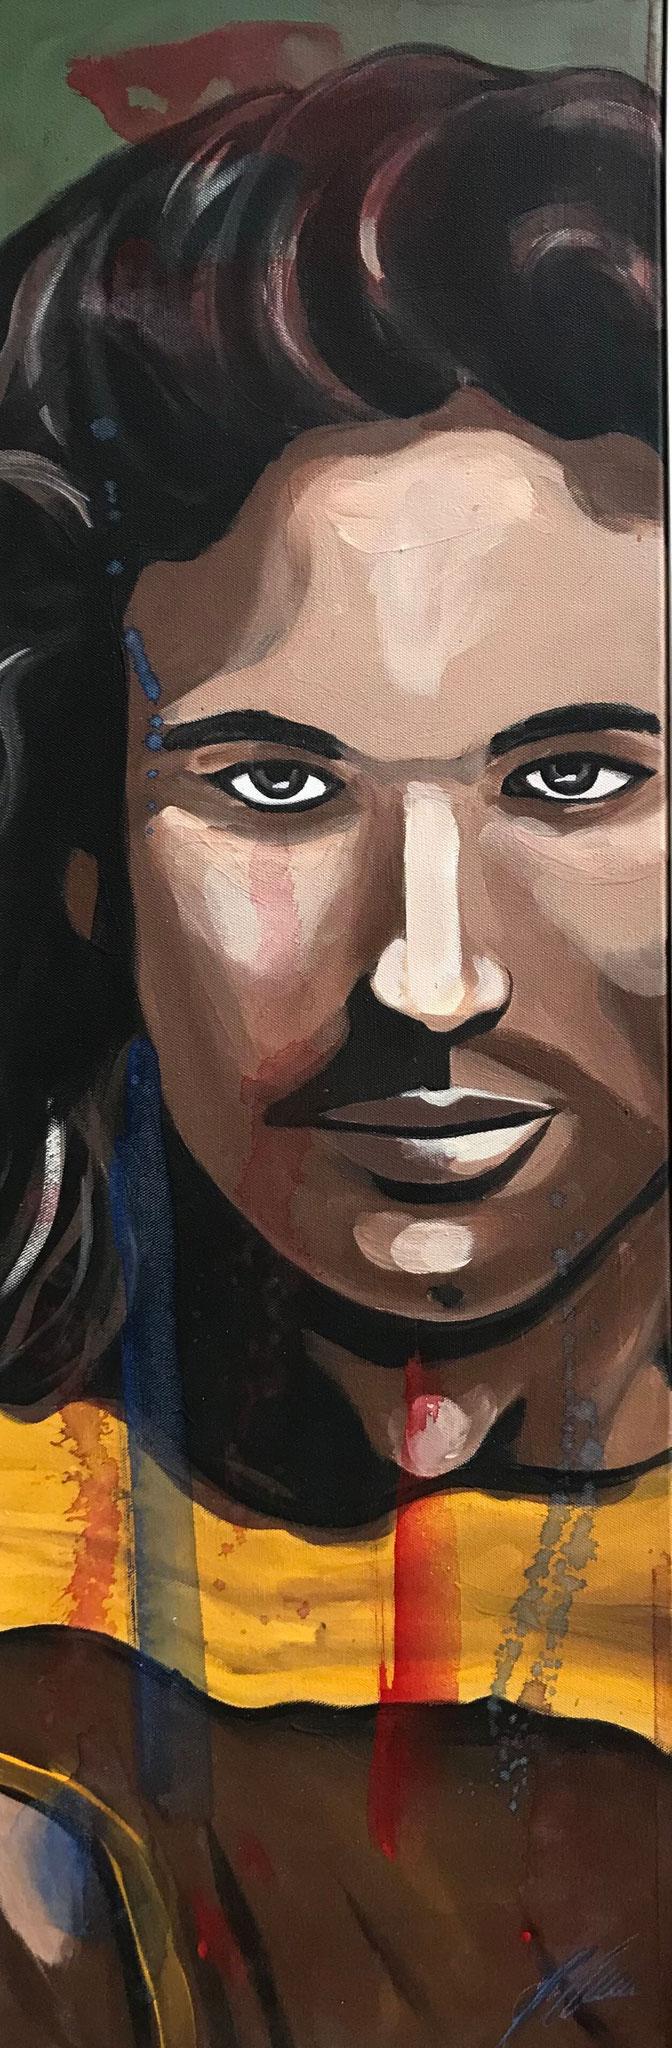 "Fr. 520.00 ""Portrait Mann"" Acryl auf Leinwand mit Rahmen 30 x 90 cm."